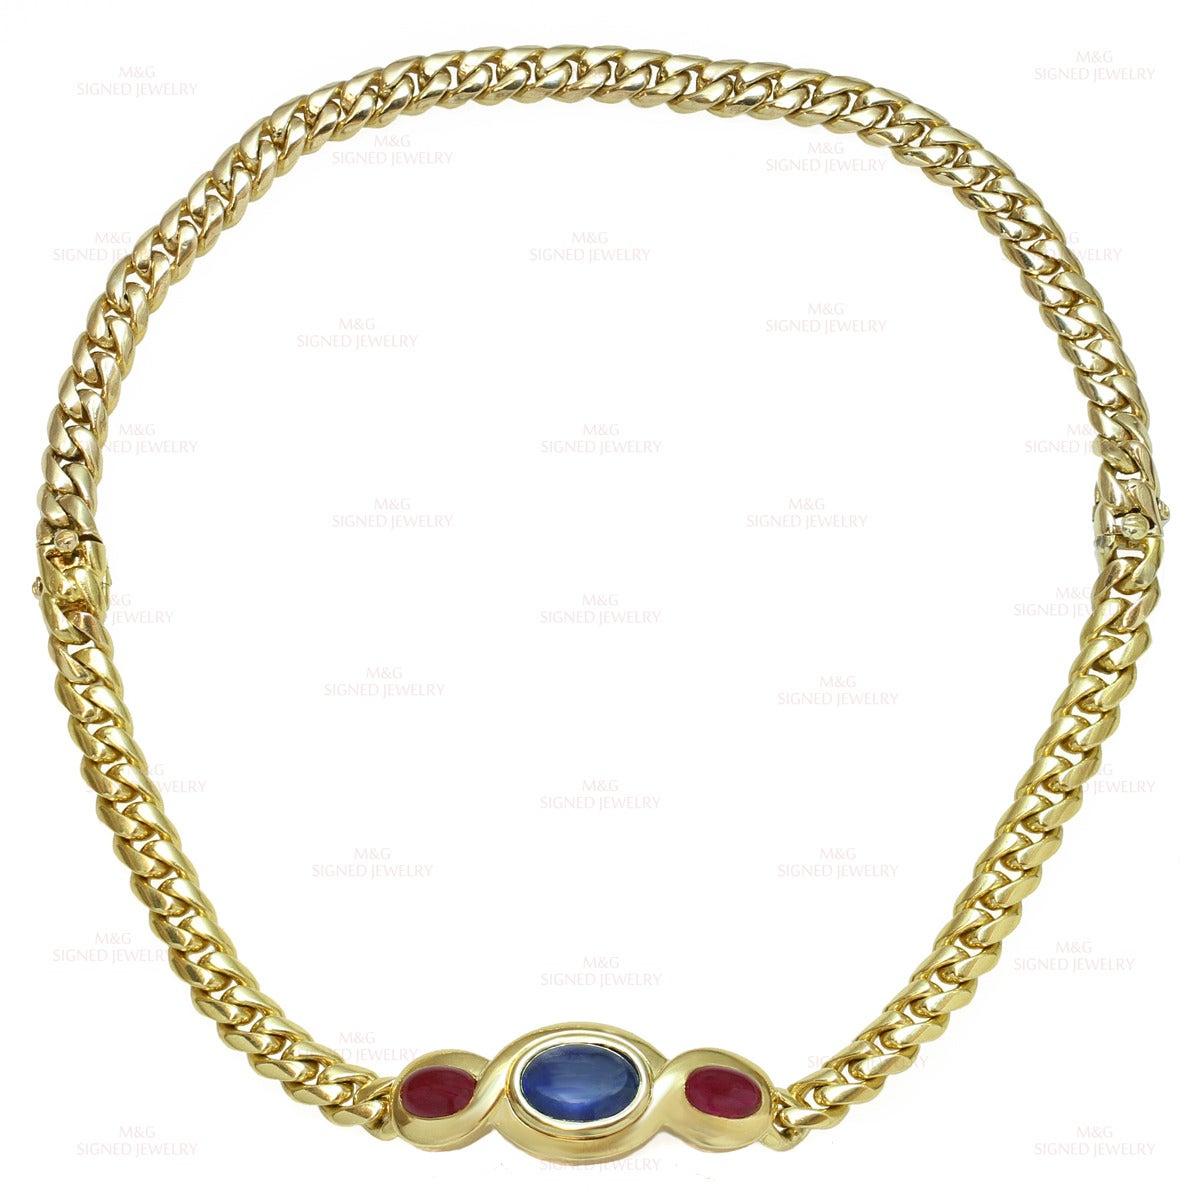 1980s Bulgari Classic Sapphire Ruby Gold Link Interchangeable Bracelet Necklace 7